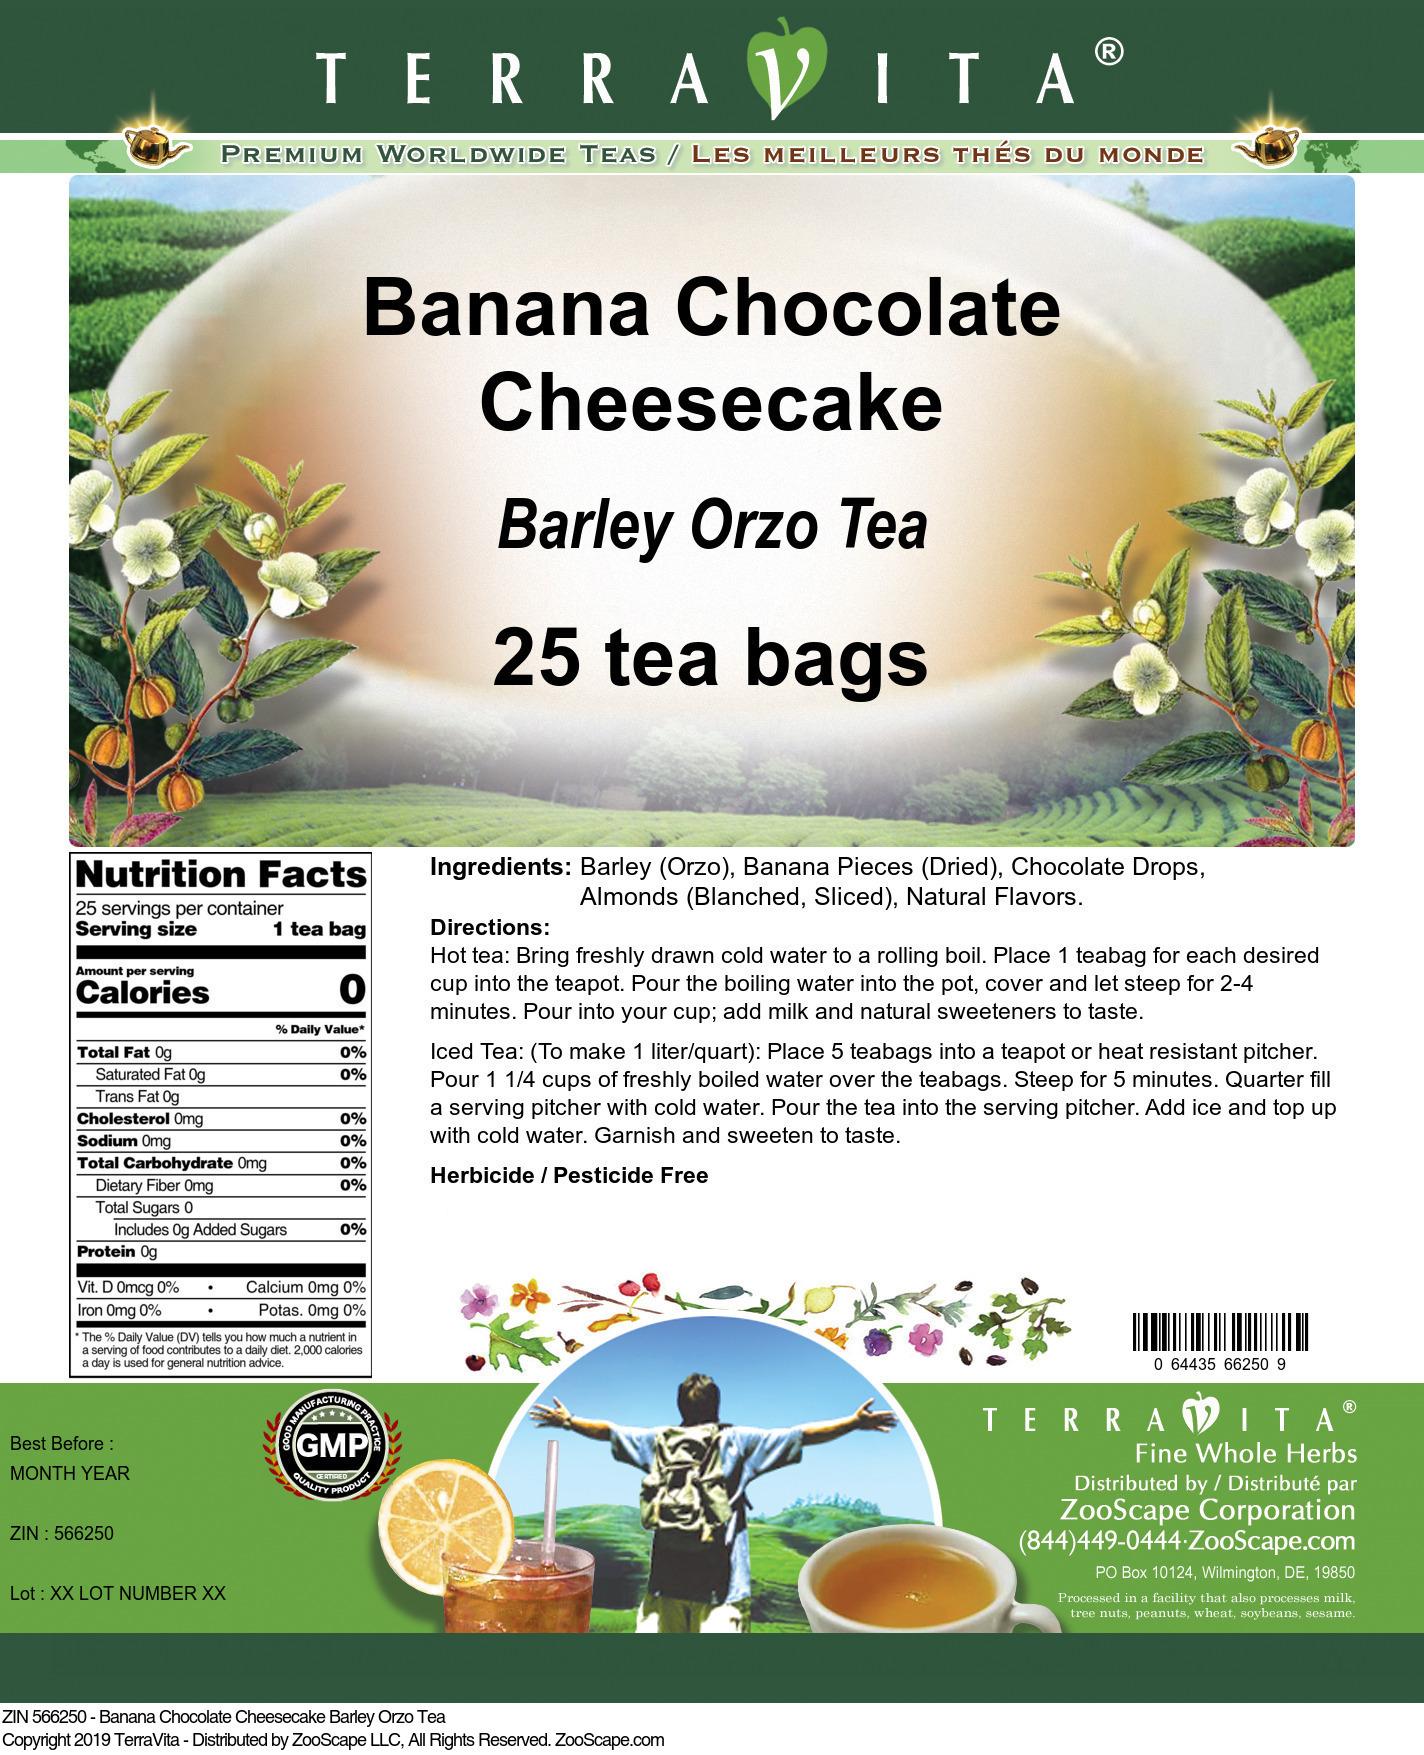 Banana Chocolate Cheesecake Barley Orzo